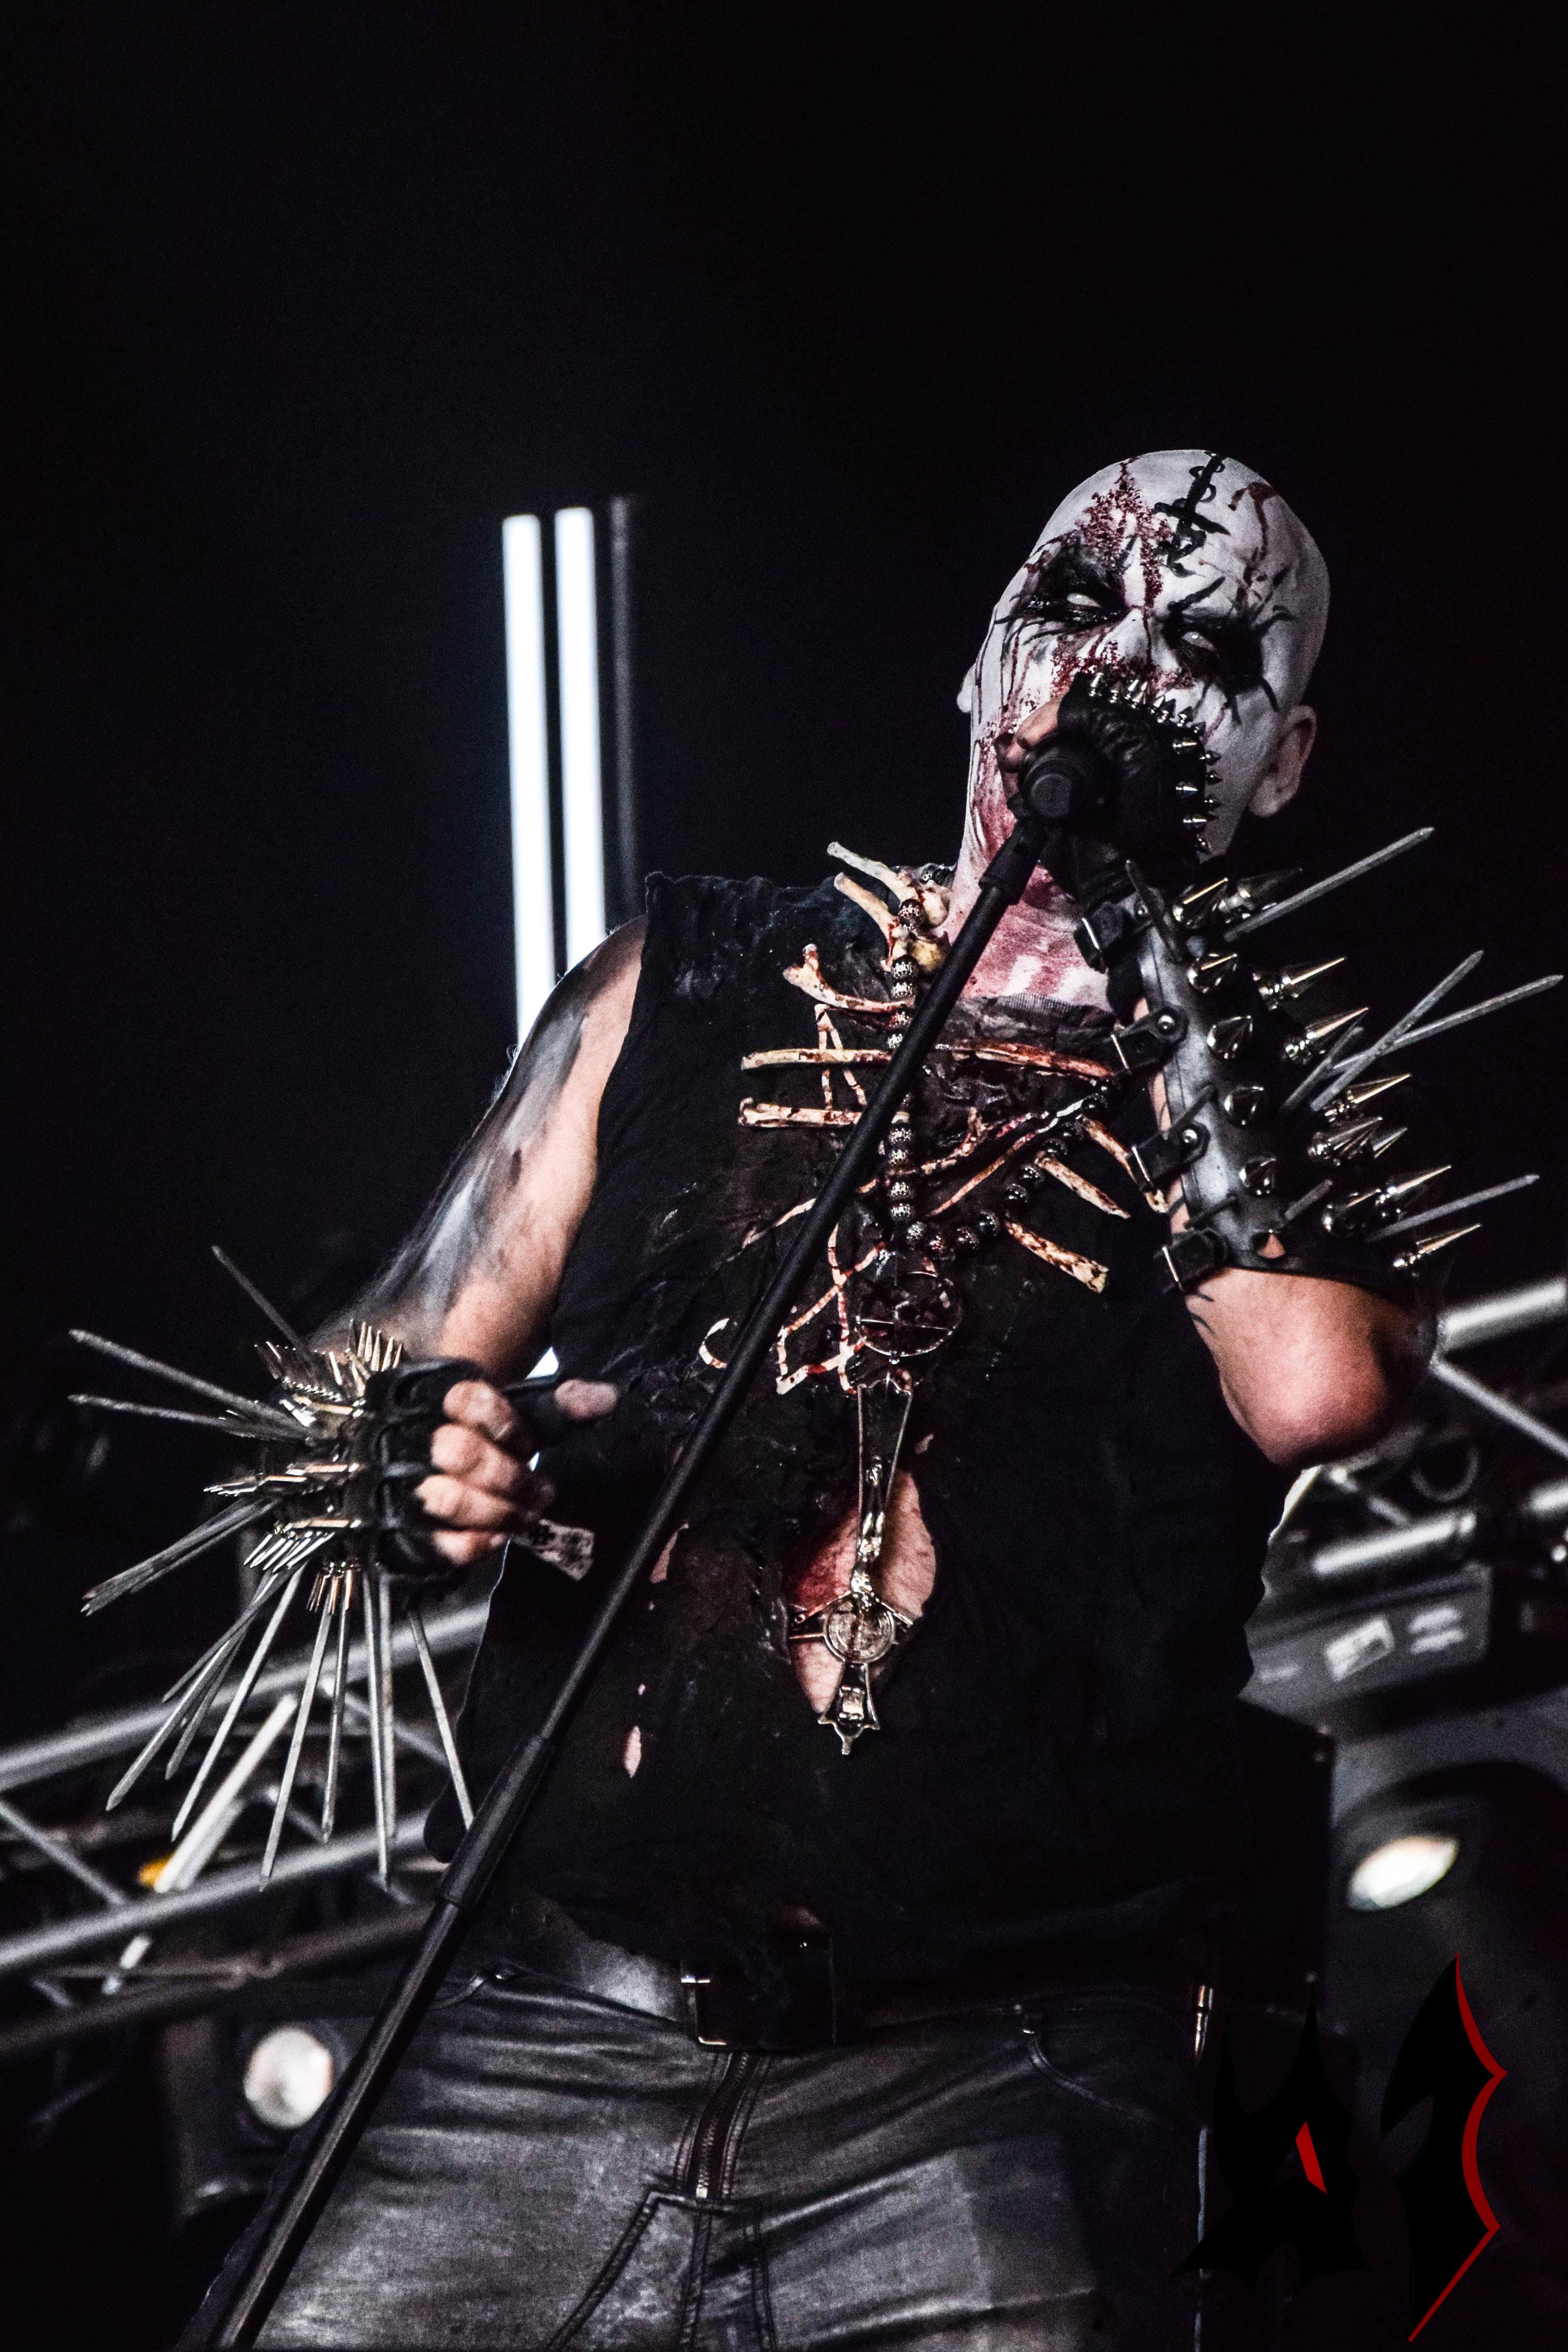 Hellfest - Day 1 - Nordjevel 1